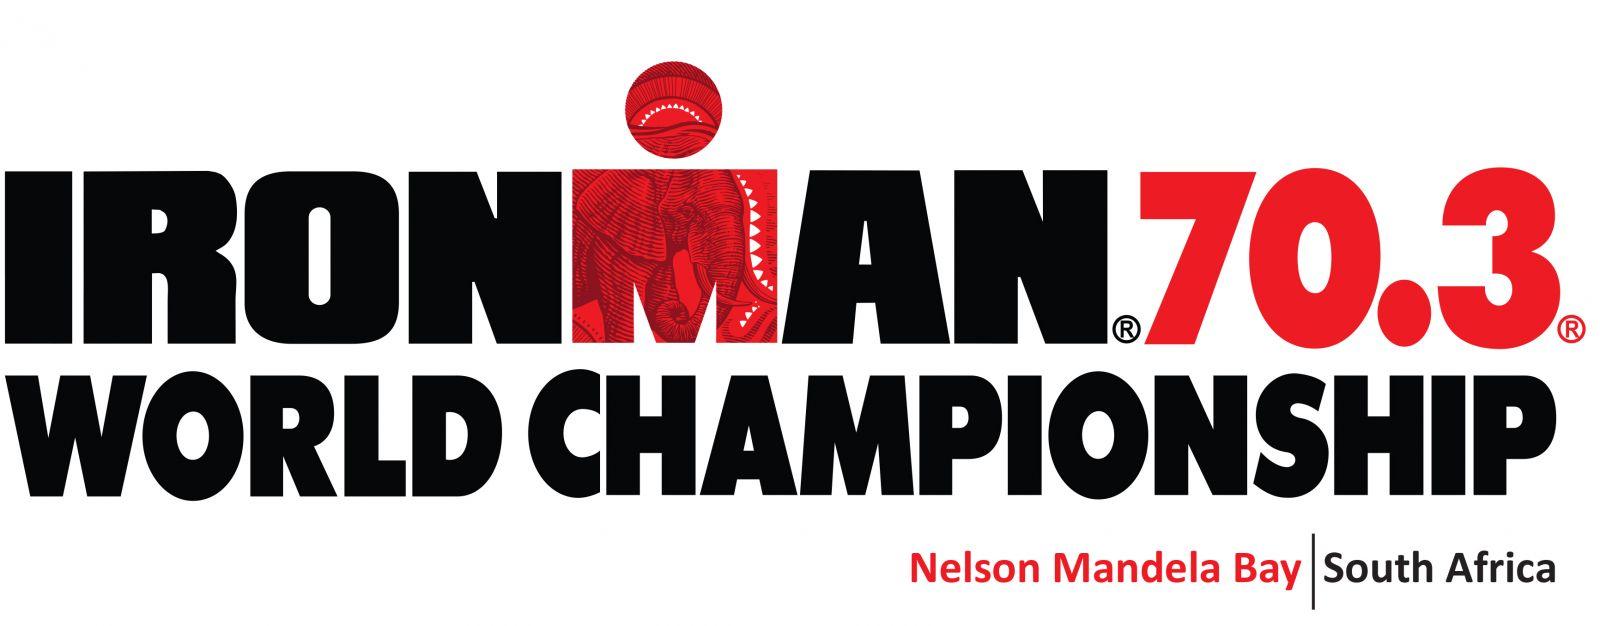 IRONMAN 70_3 World Champs - Black_Red Logo.jpg